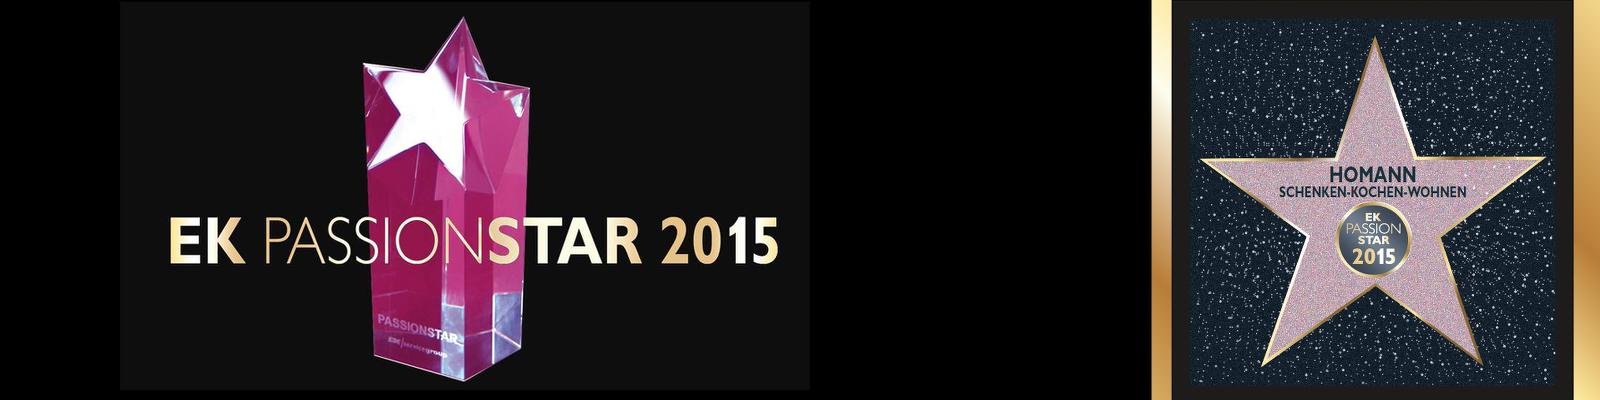 Passion Star Gewinner 2015